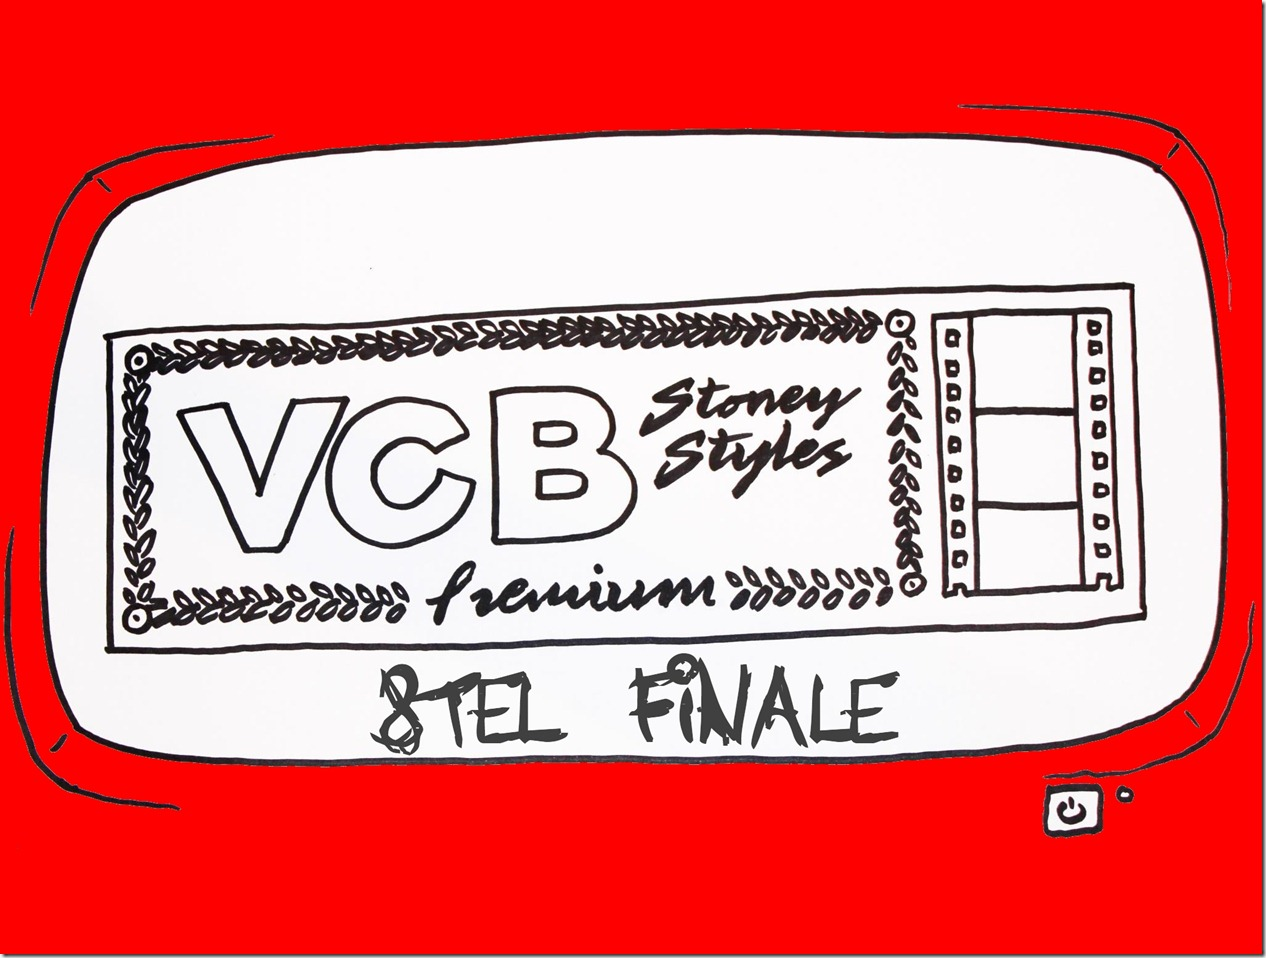 VCB-8tel-Finale-2012-Hinrunde-Rueckrunde